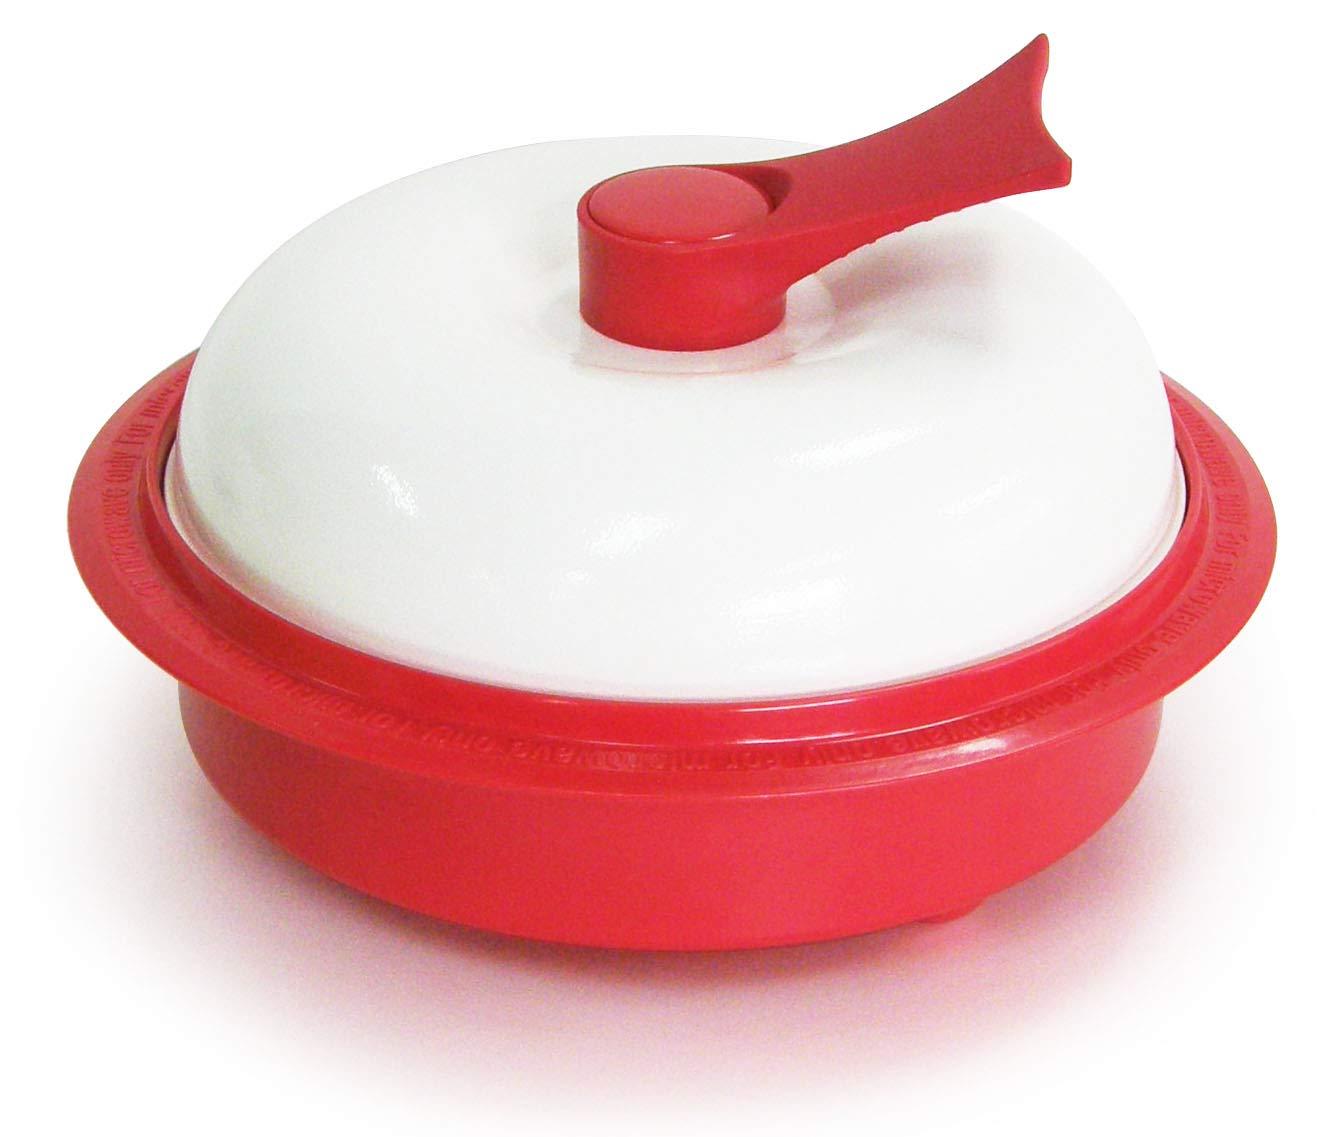 RANGEMATE MICROWAVEABLE COOKWARE (Multi Cooker)